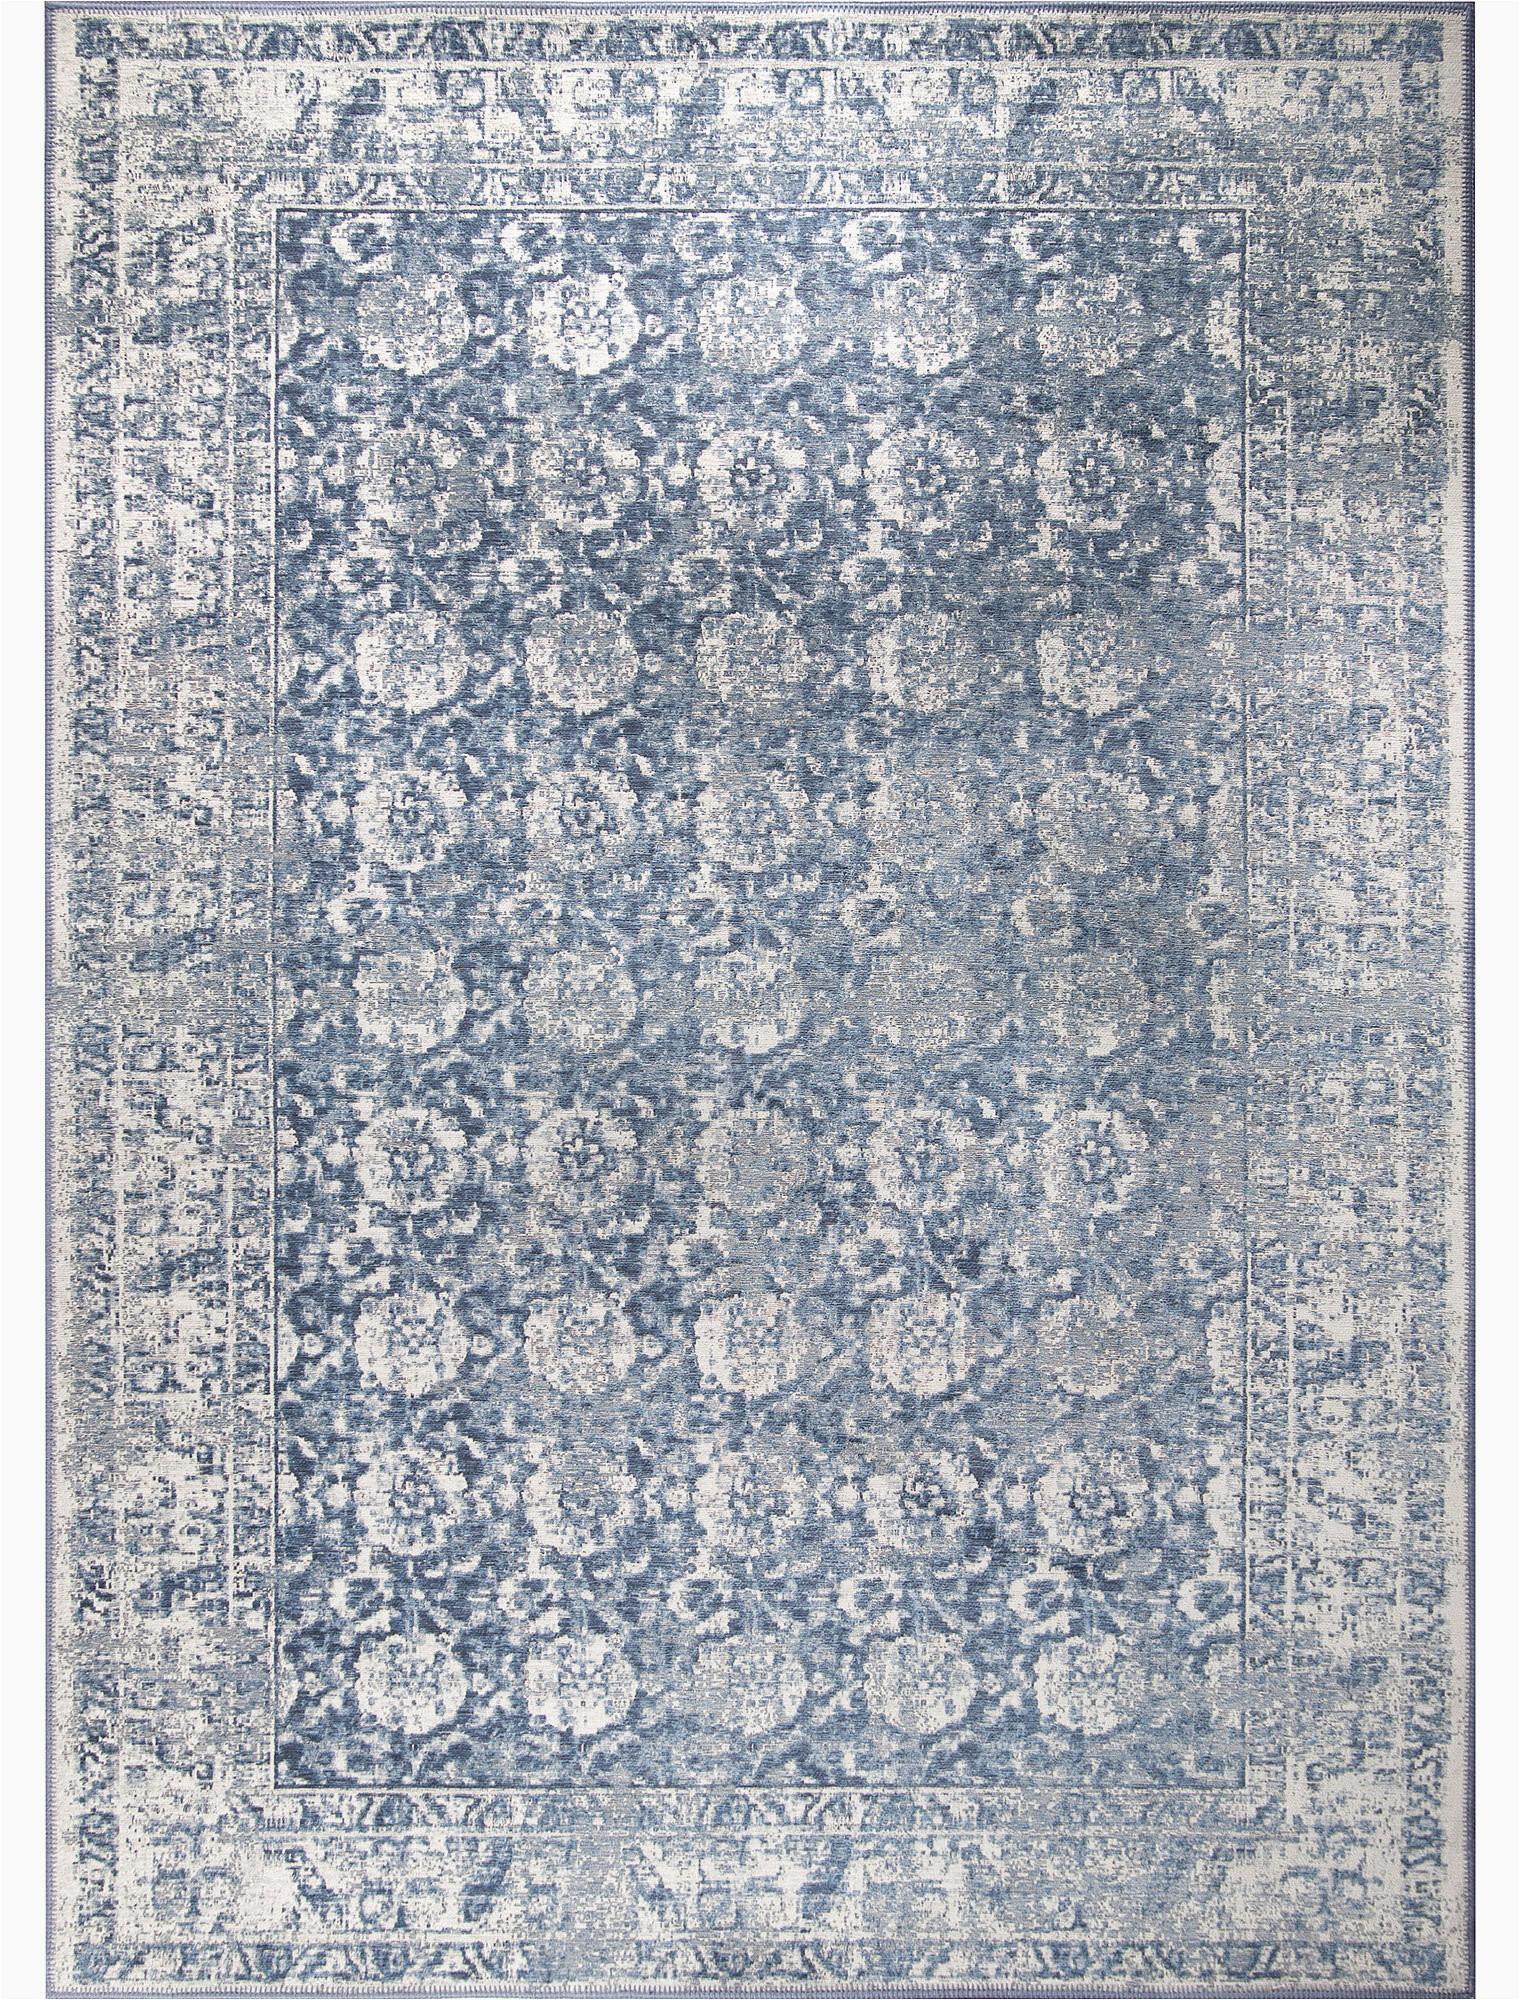 gareth woolcotton slate blue area rug